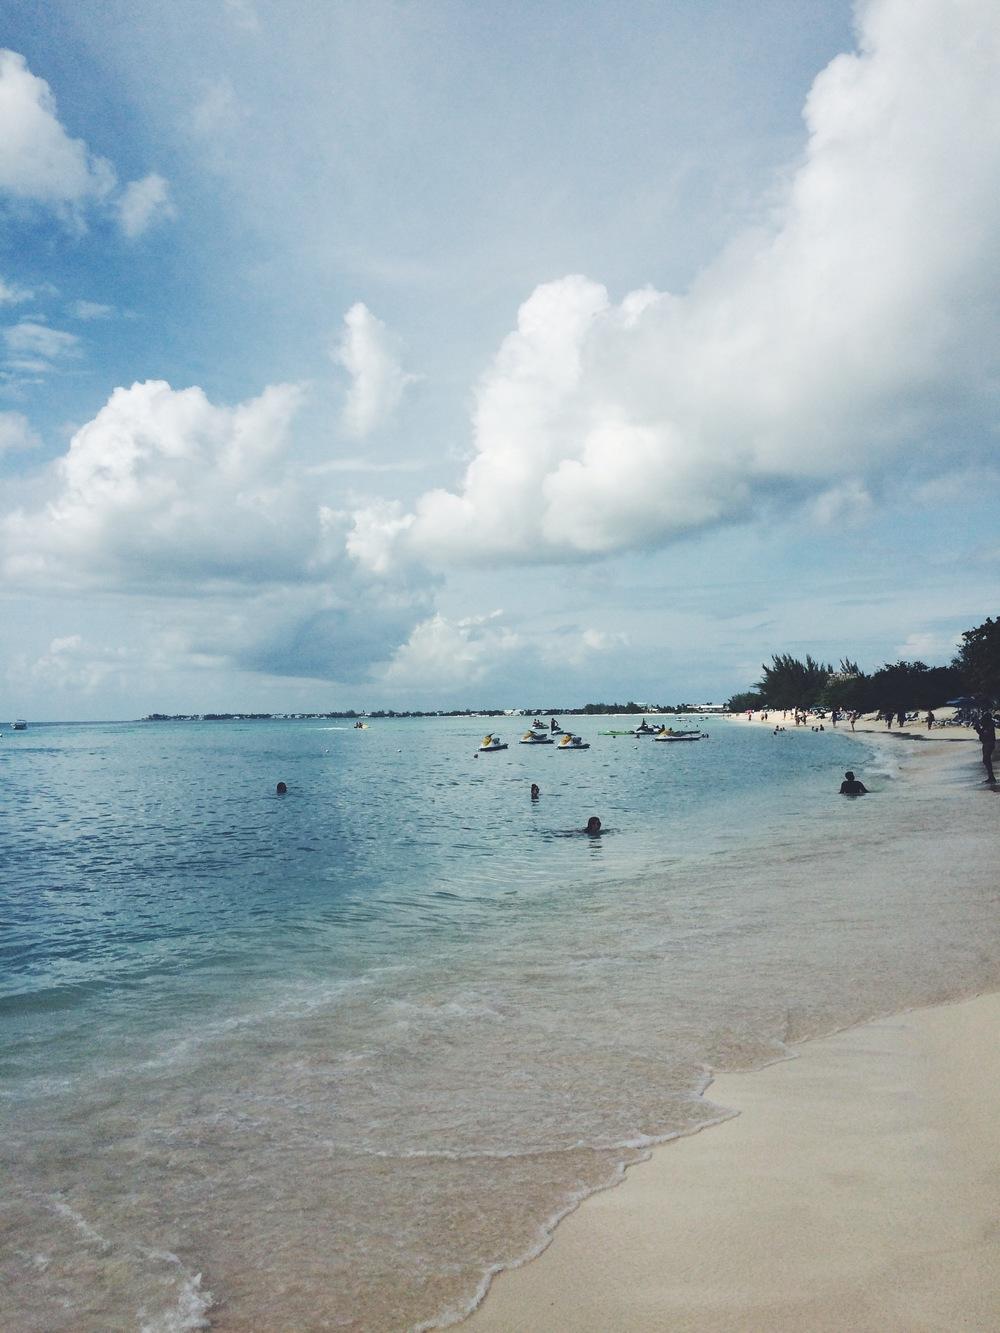 7 Mile Beach in Grand Cayman